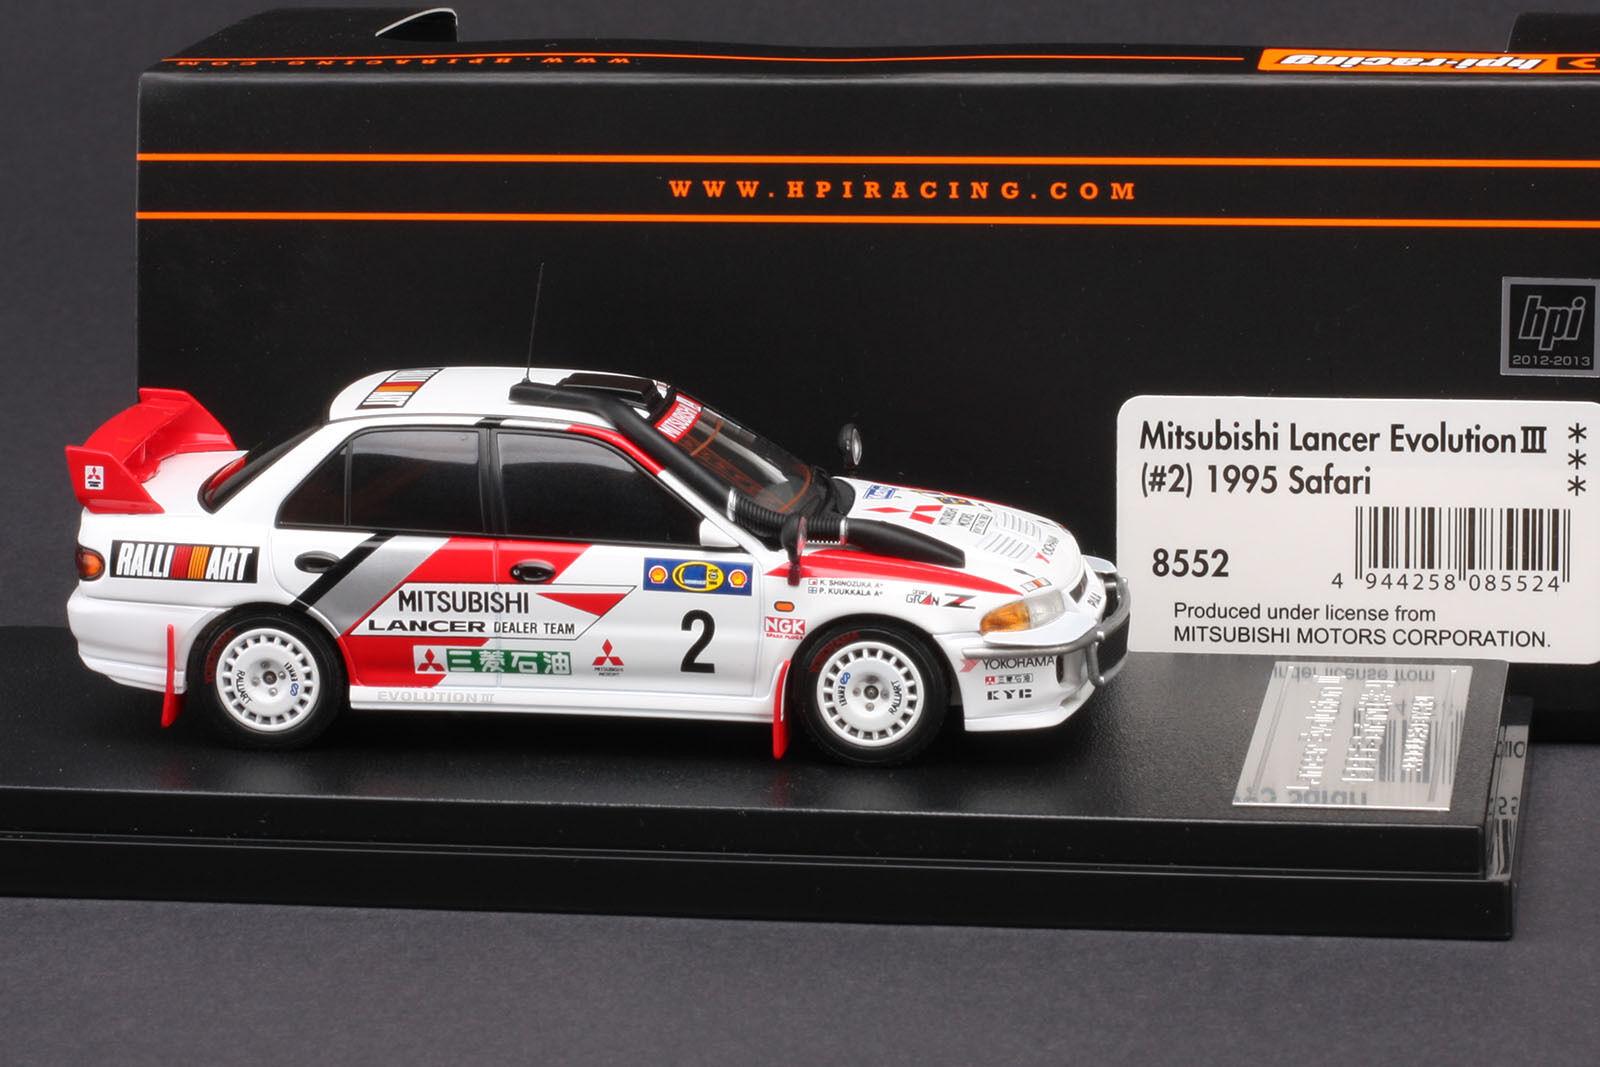 Mitsubishi LANCER LANCER LANCER EVO III  2 1995 Safari Rally  Pentti kuukkula  Hpi  8552 1 43 b354f3